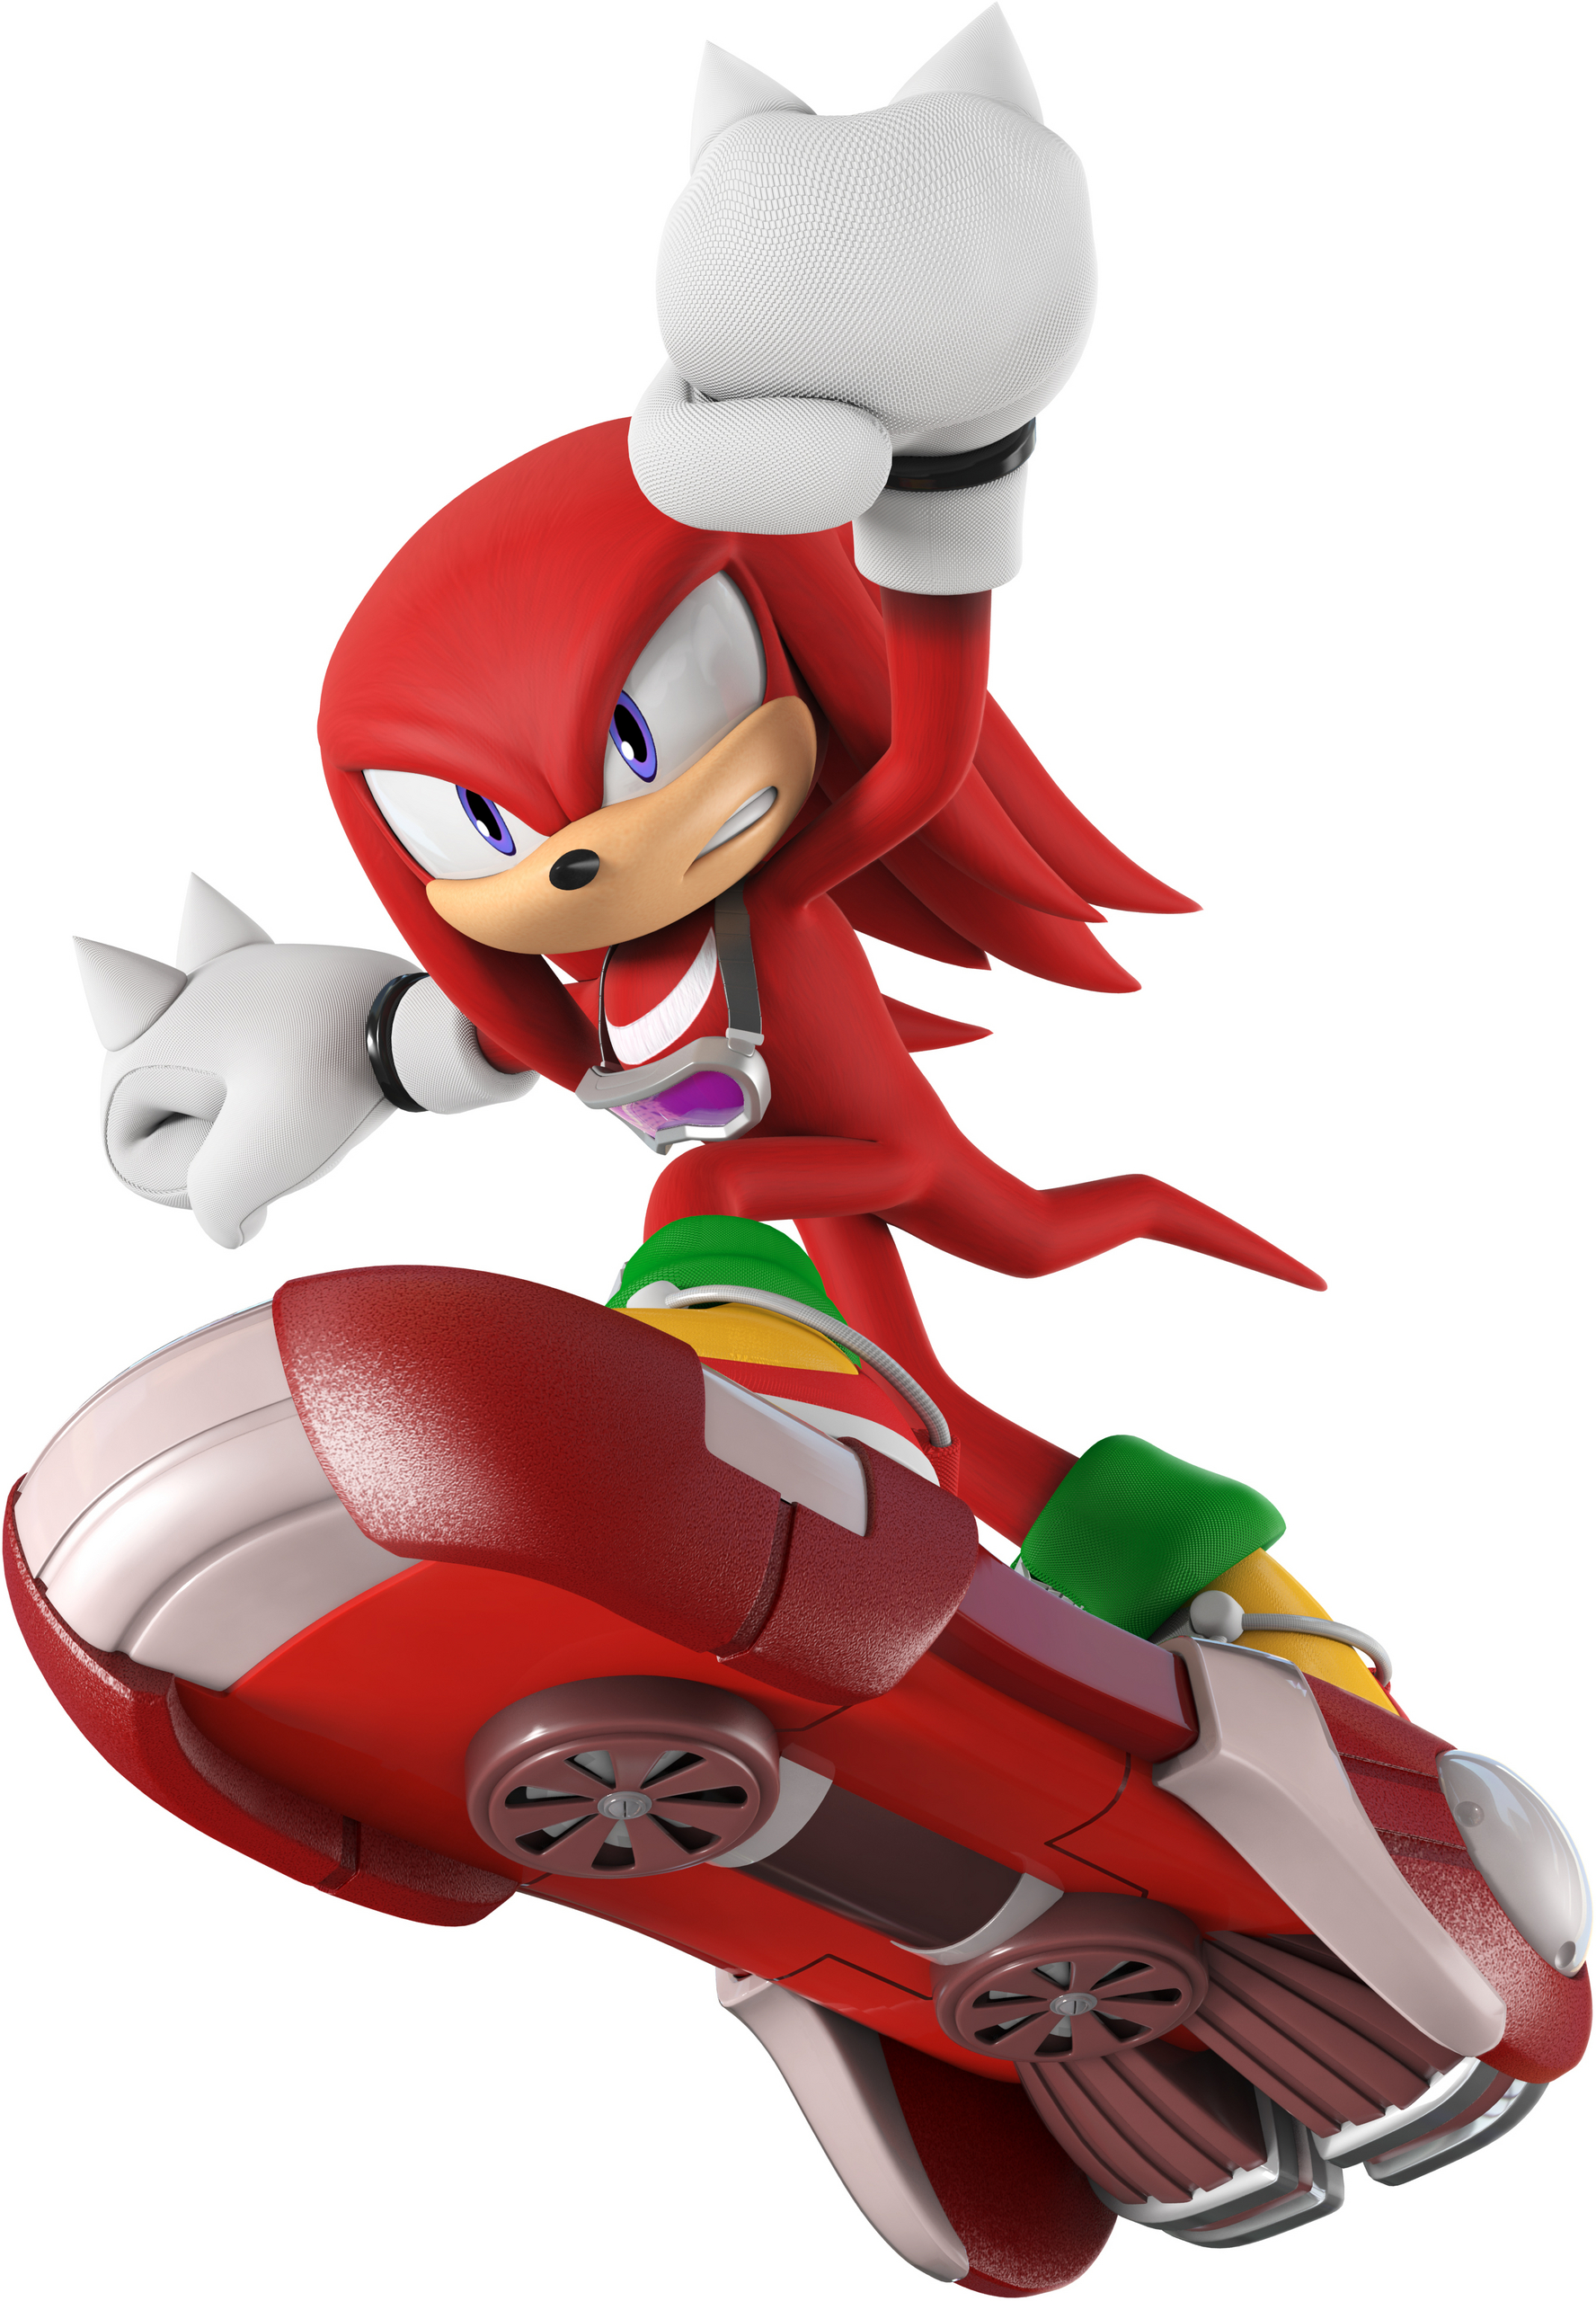 Knuckles The Echidna Sonic The Hedgehog Image 459797 Zerochan Anime Image Board